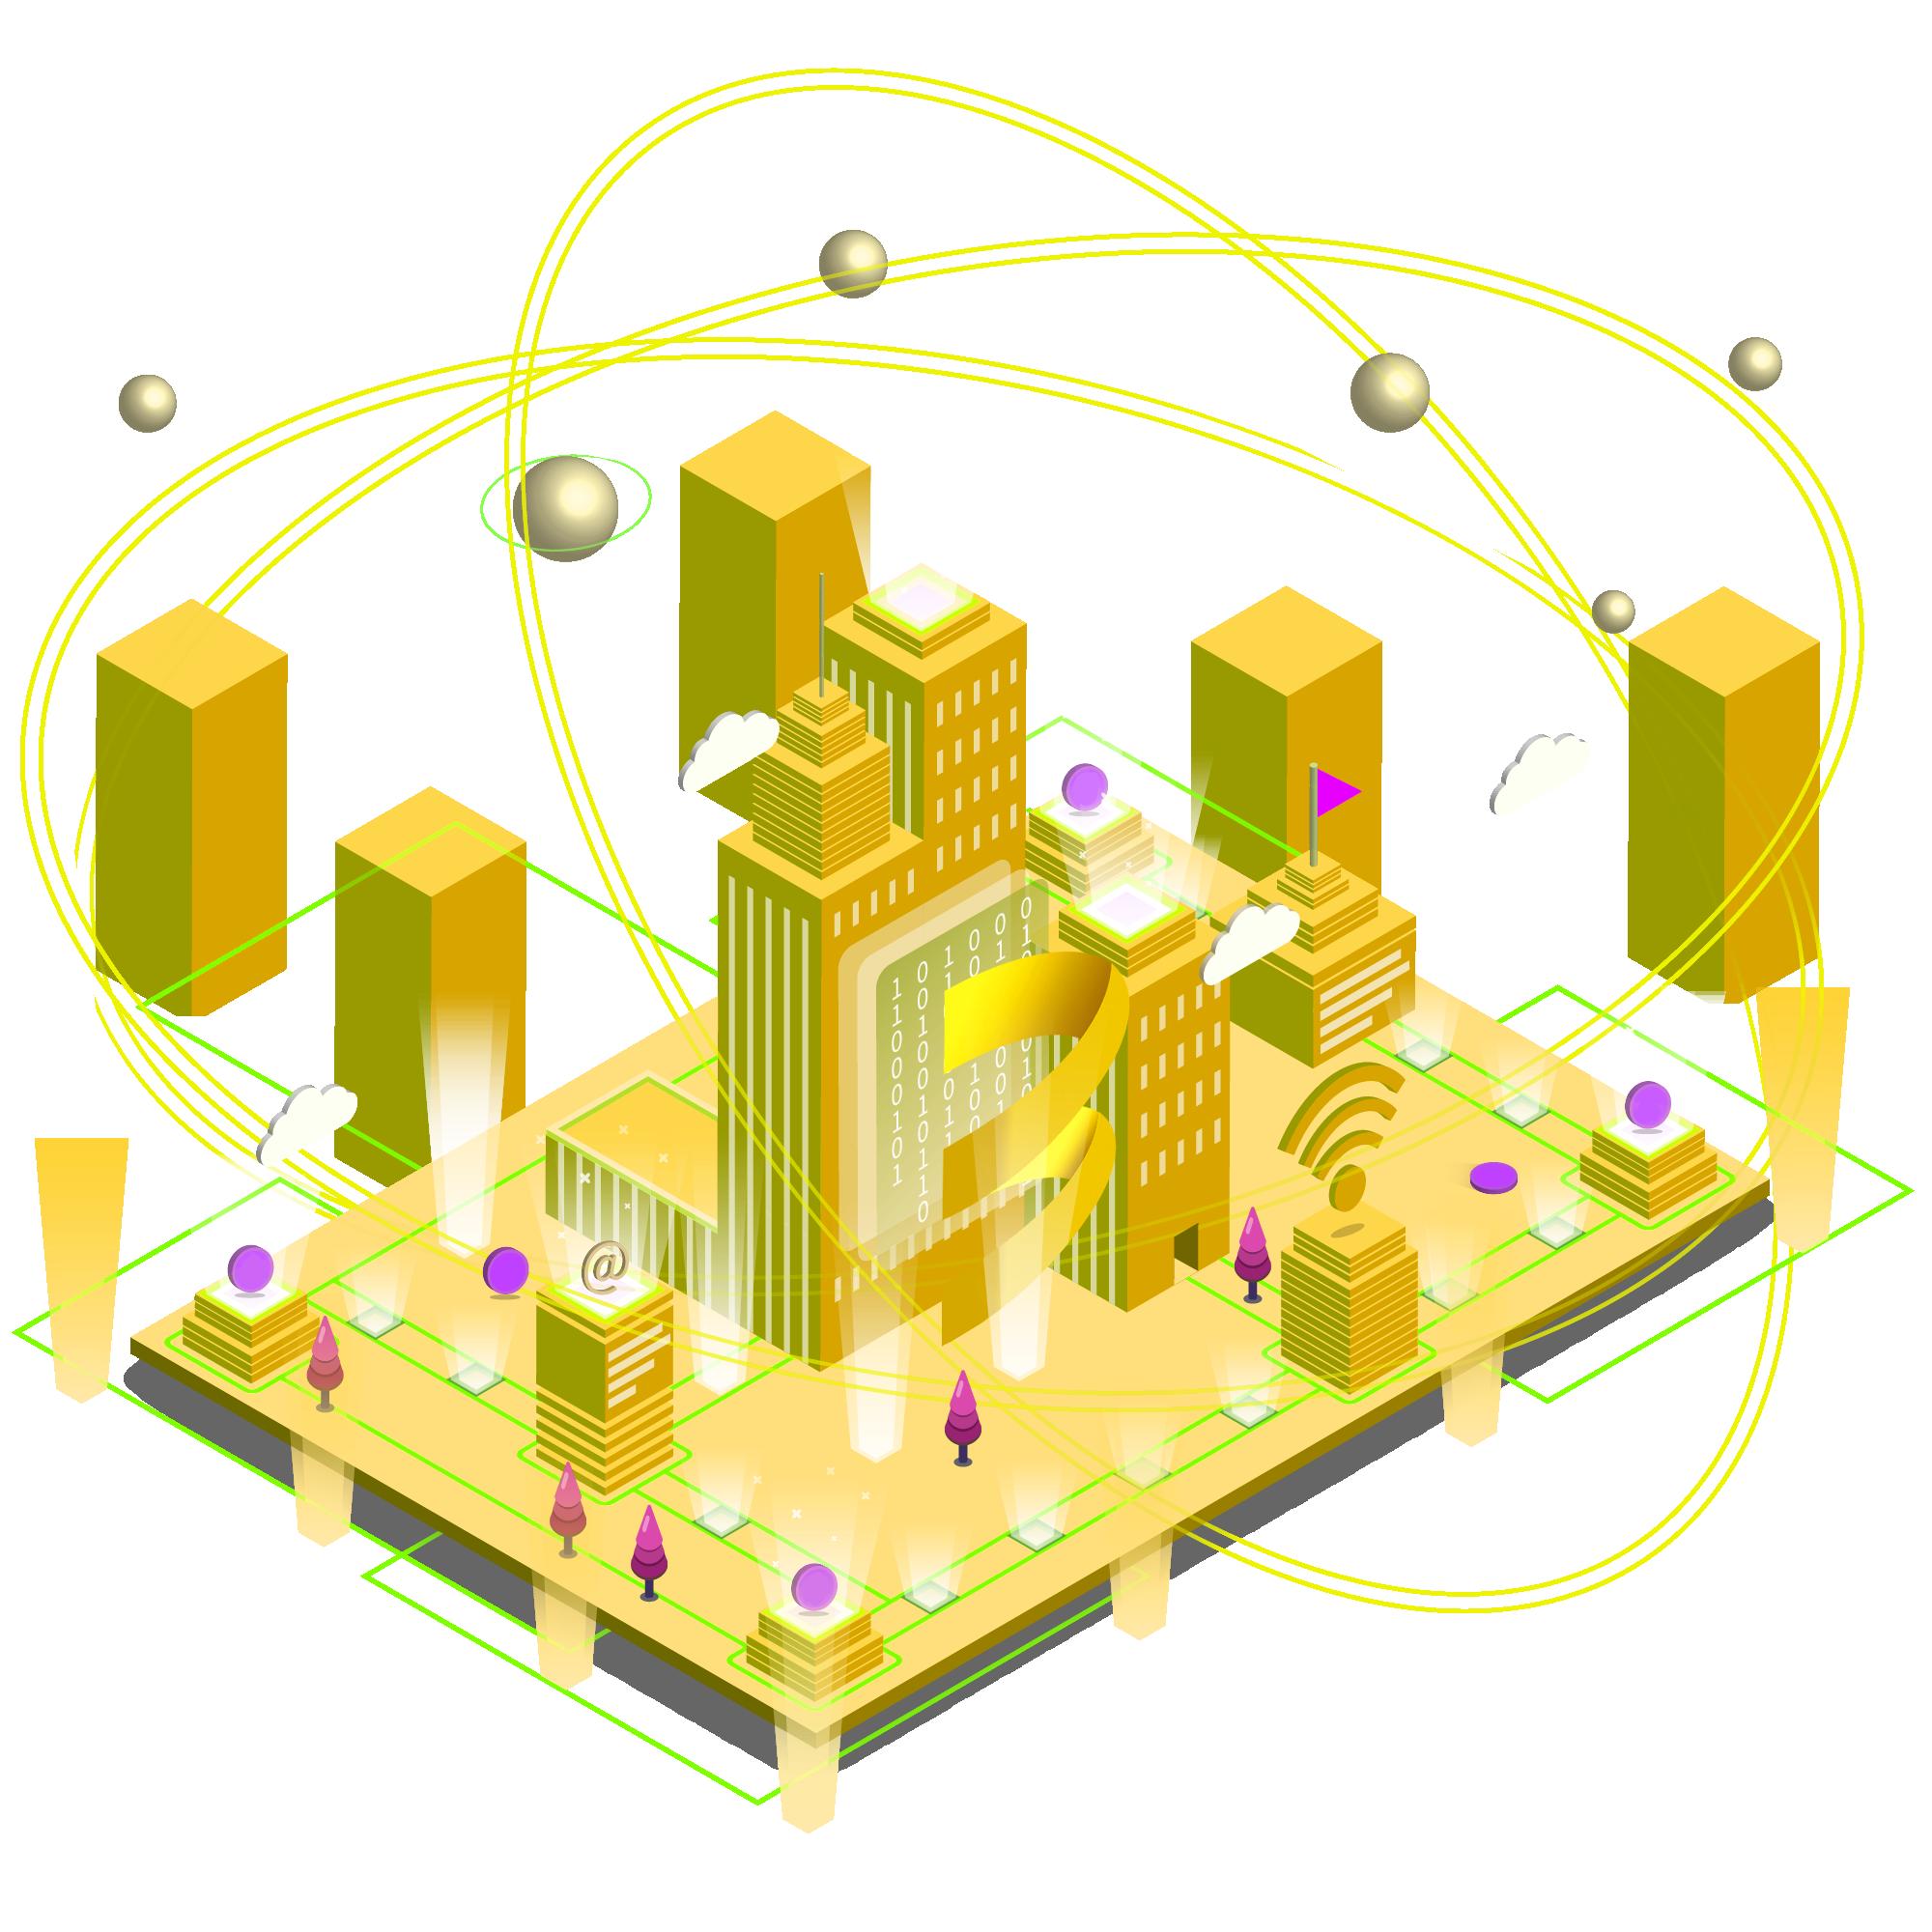 Batihost Network